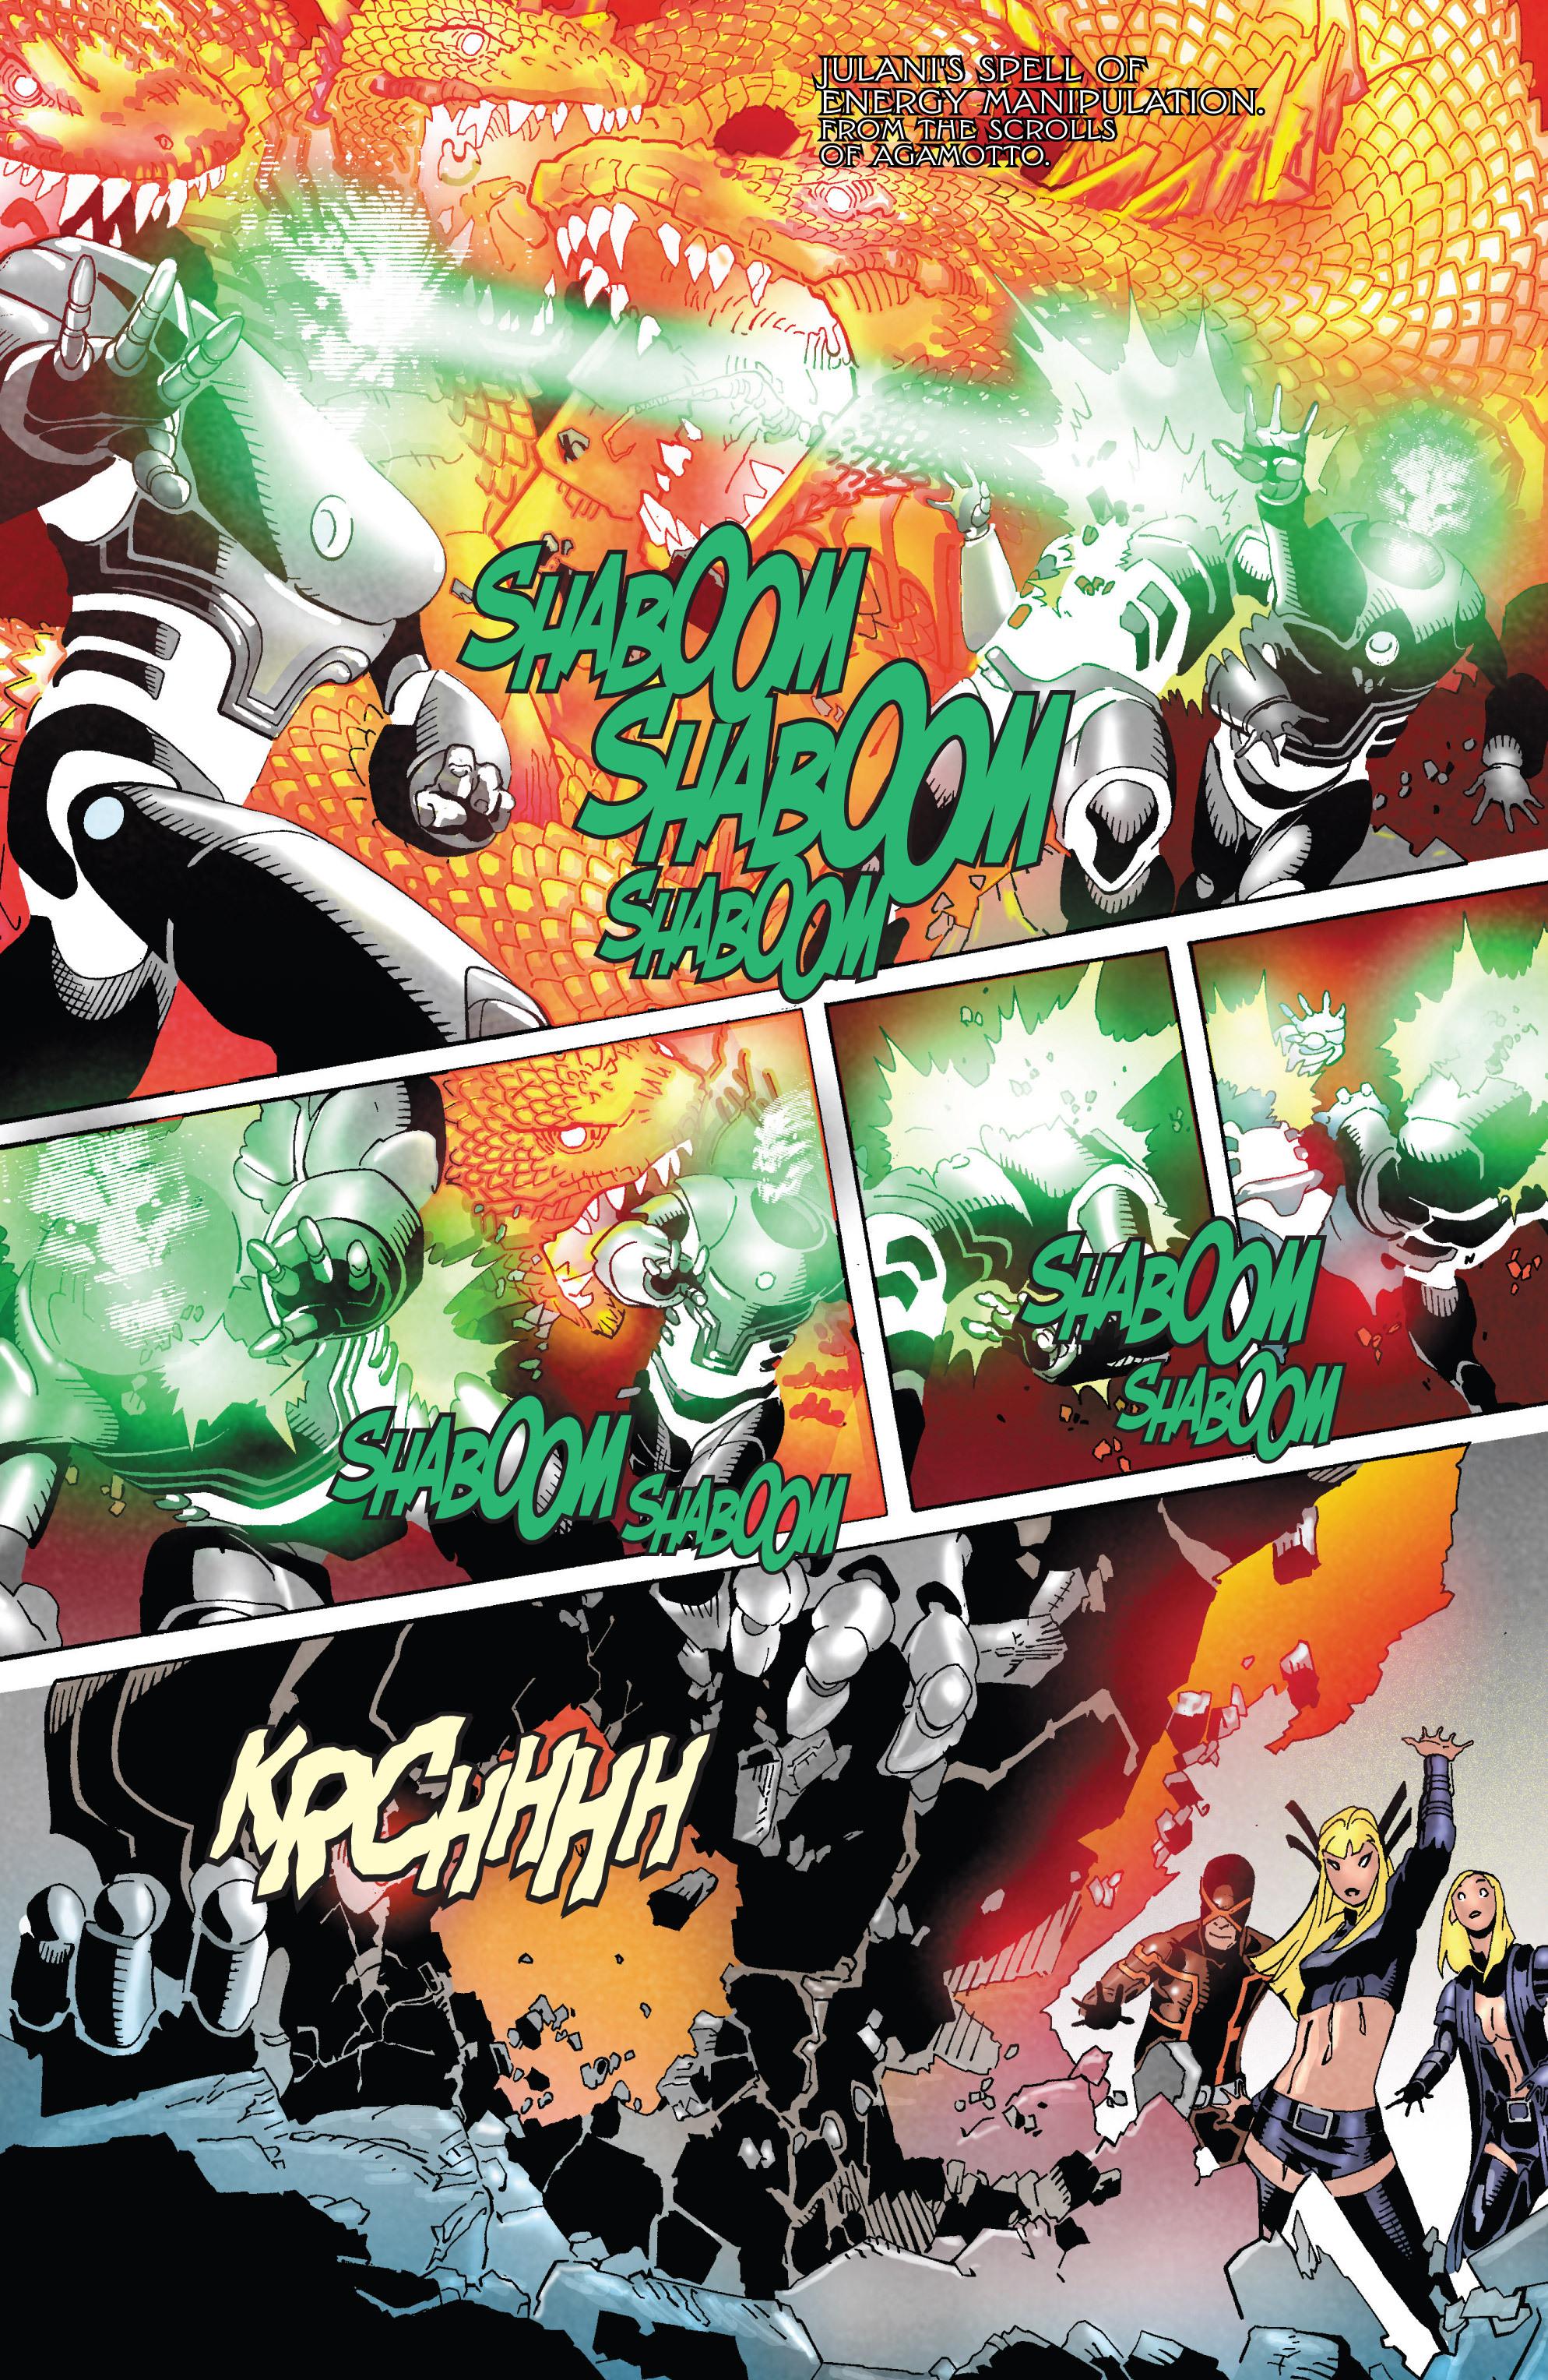 Read online Uncanny X-Men (2013) comic -  Issue # _TPB 4 - vs. S.H.I.E.L.D - 17